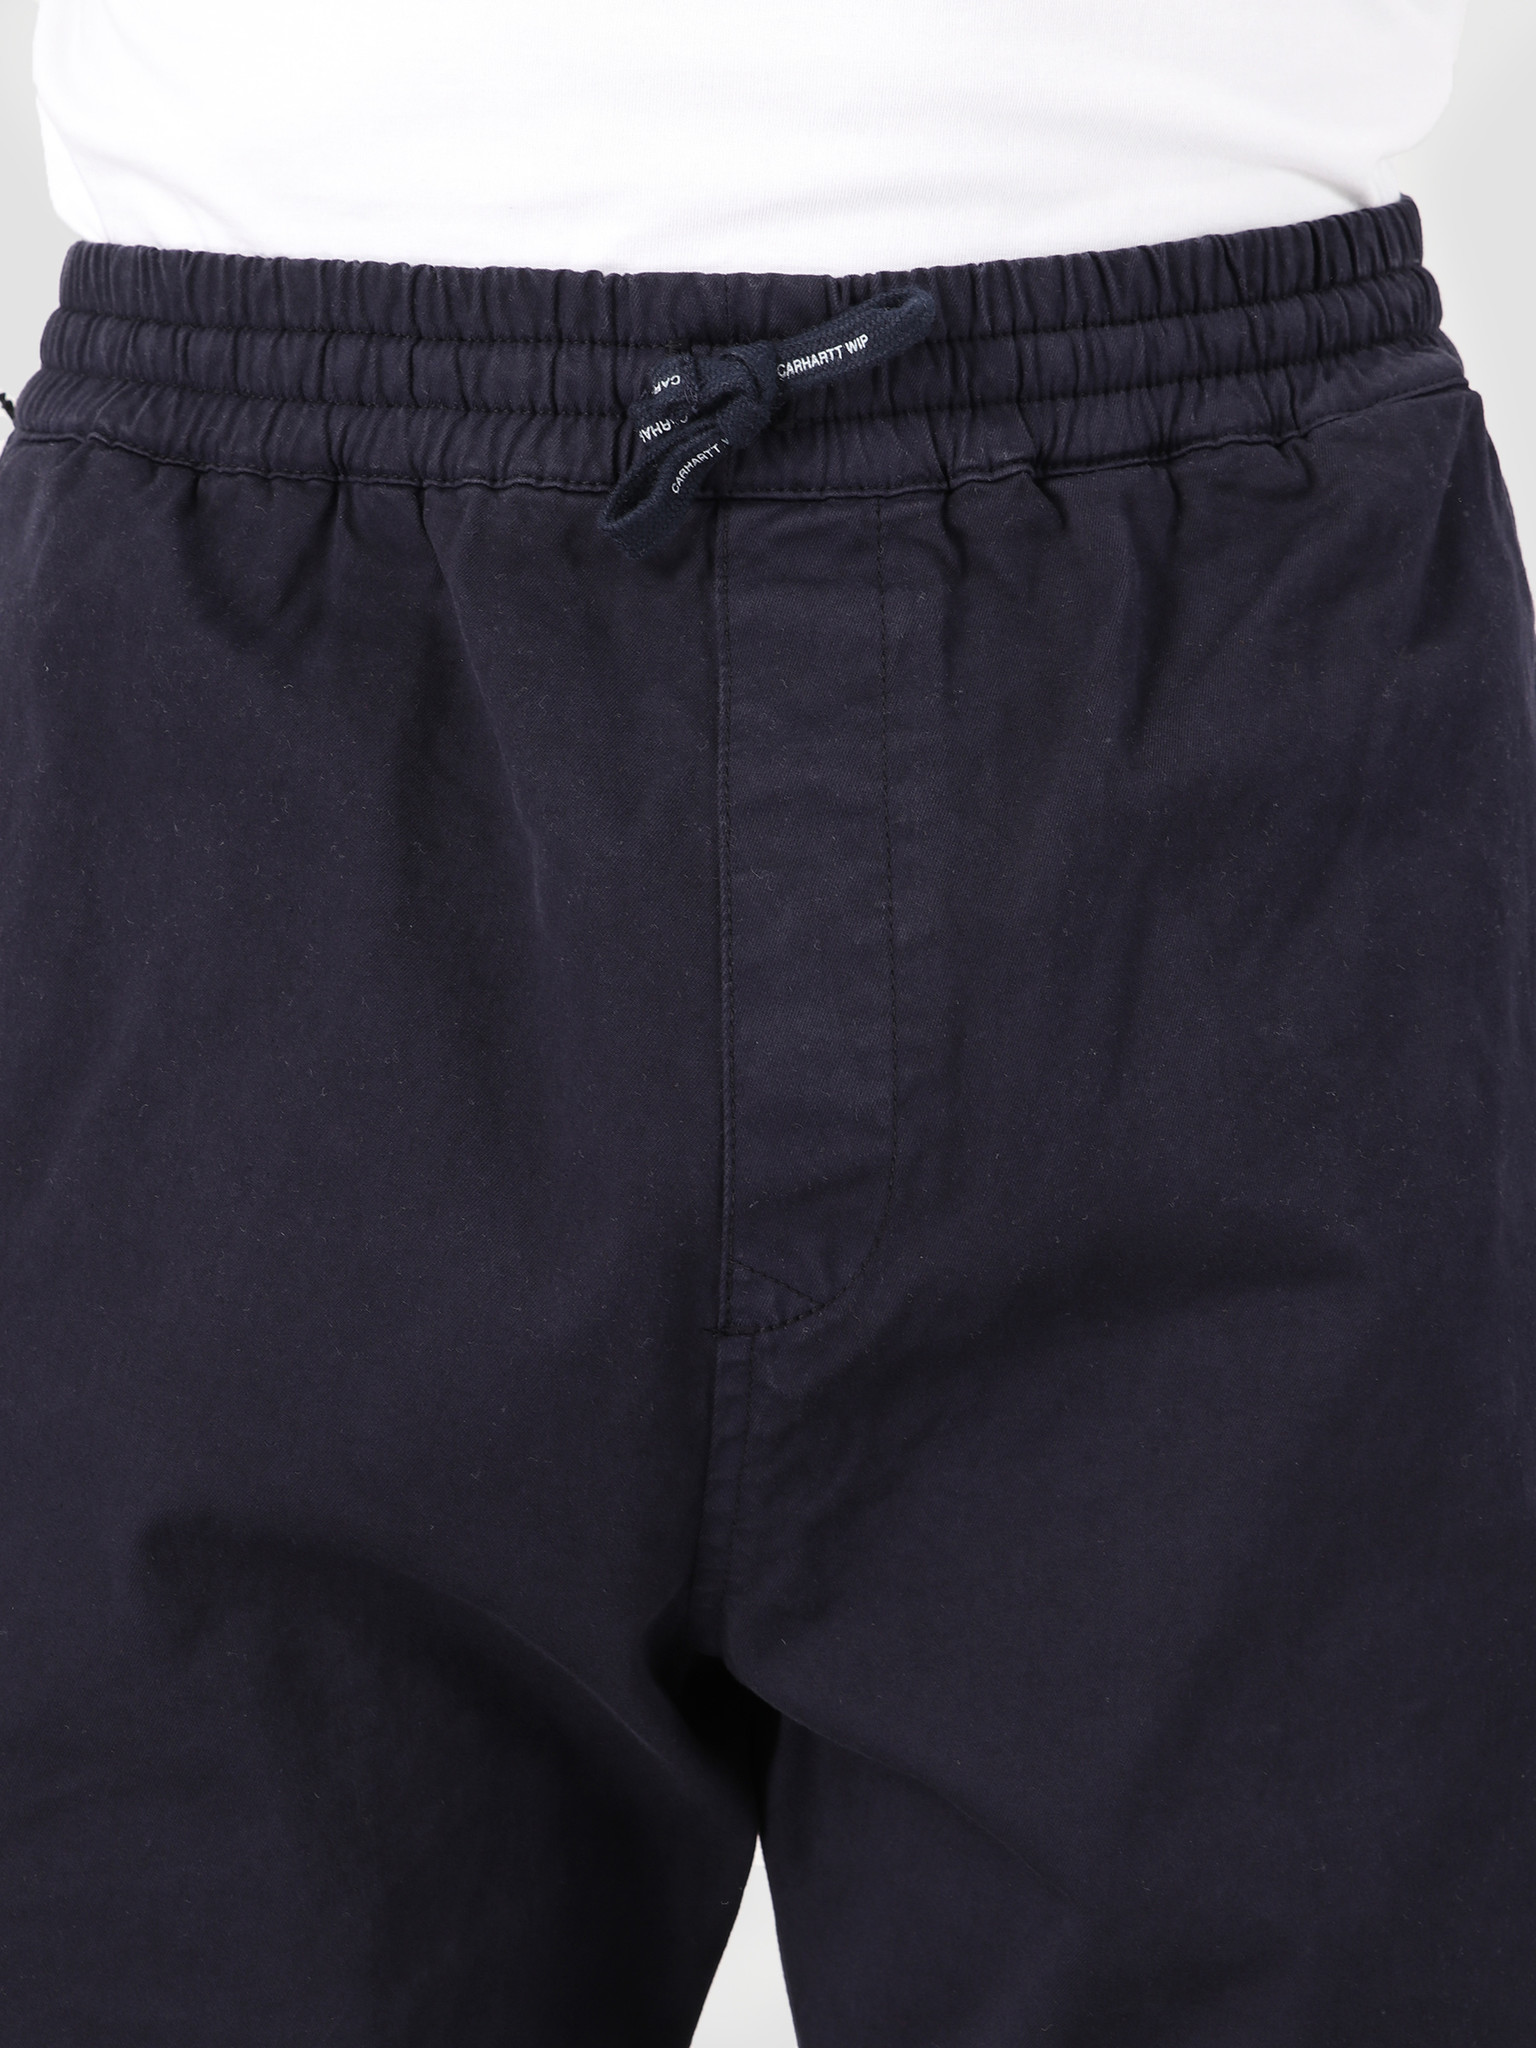 Carhartt WIP Carhartt WIP Lawton Pant Dark Navy I026517